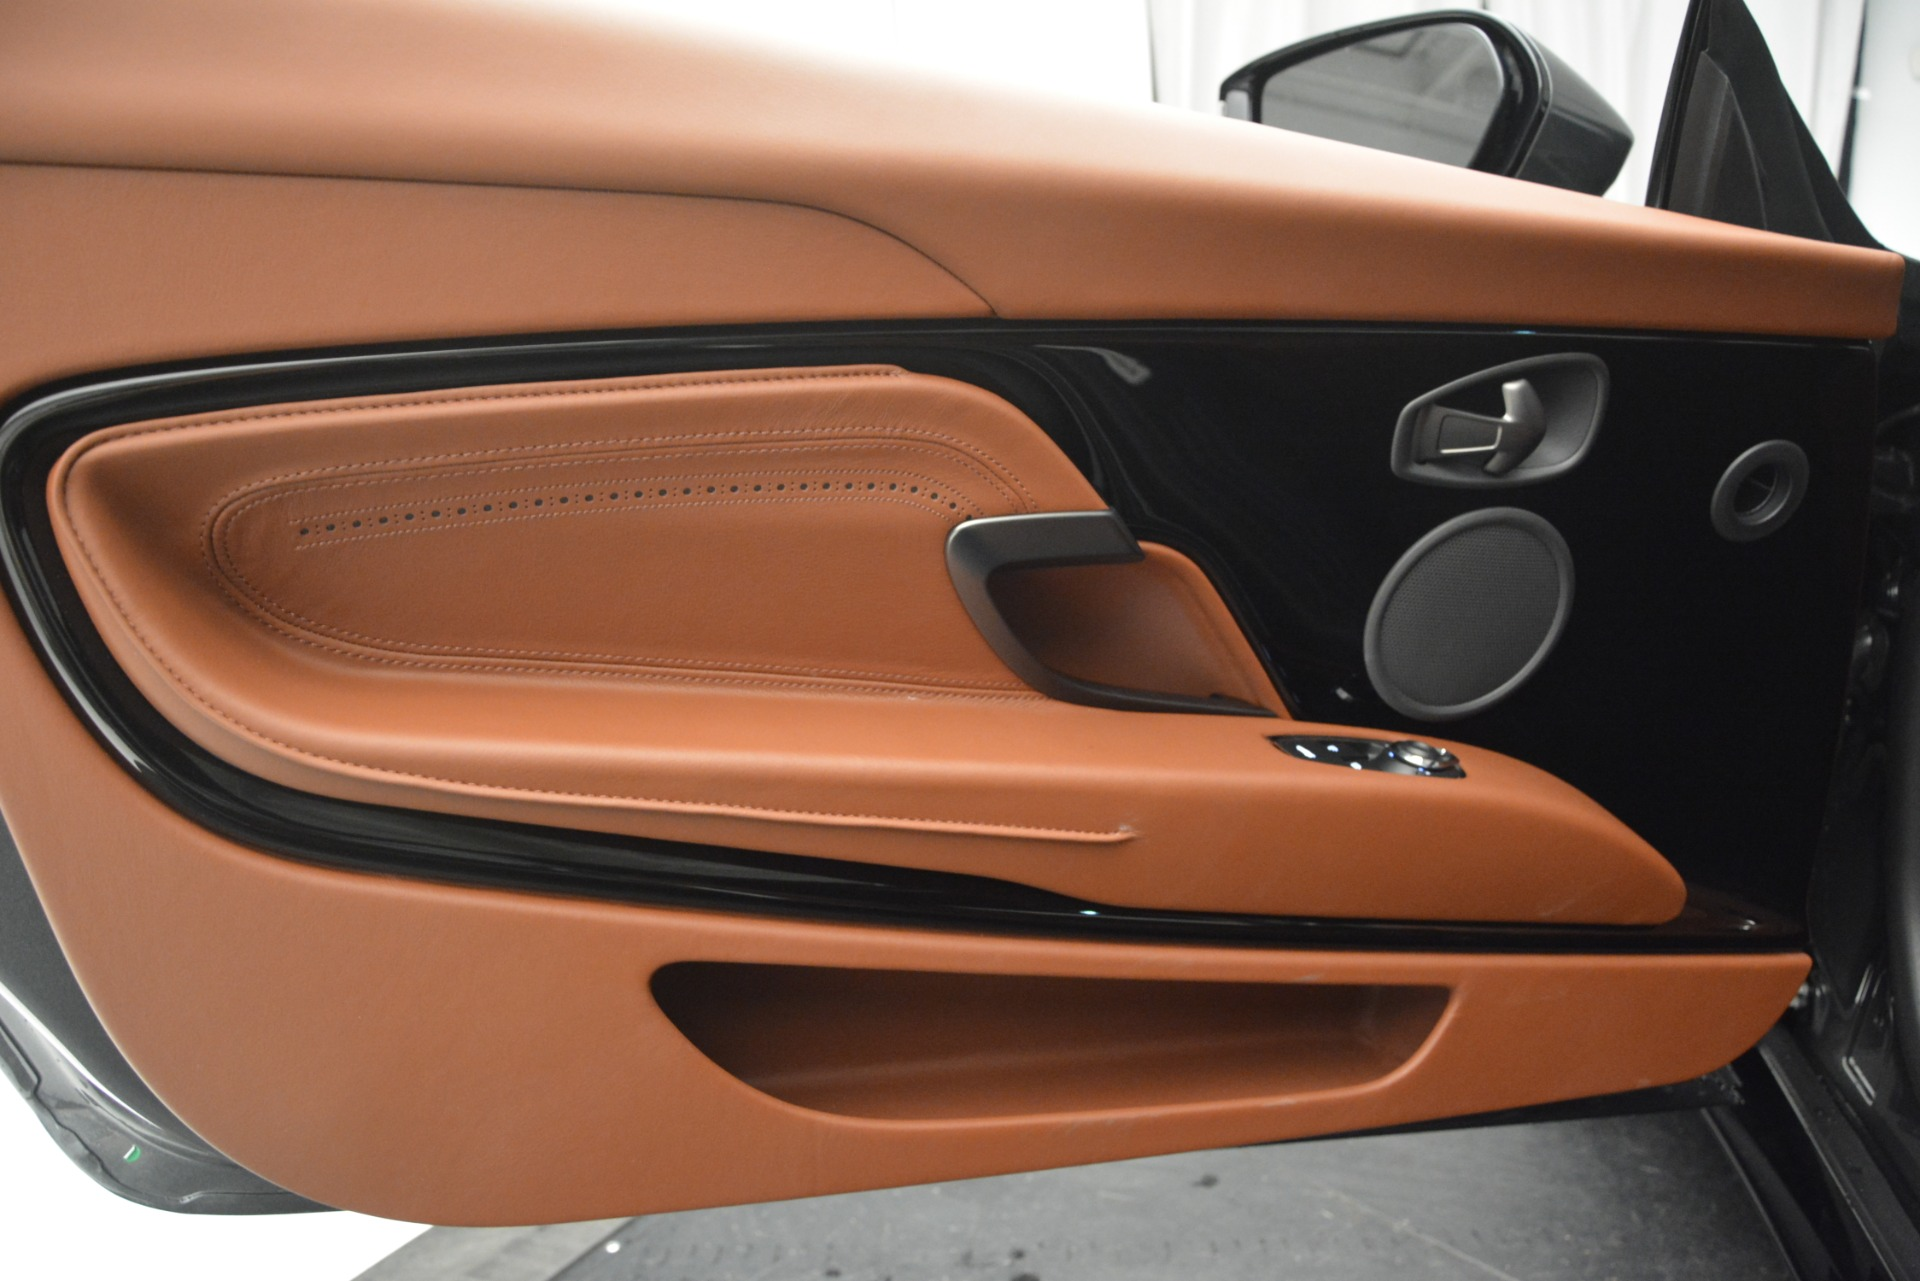 New 2019 Aston Martin DB11 V8 Convertible For Sale In Greenwich, CT. Alfa Romeo of Greenwich, A1330 2762_p24